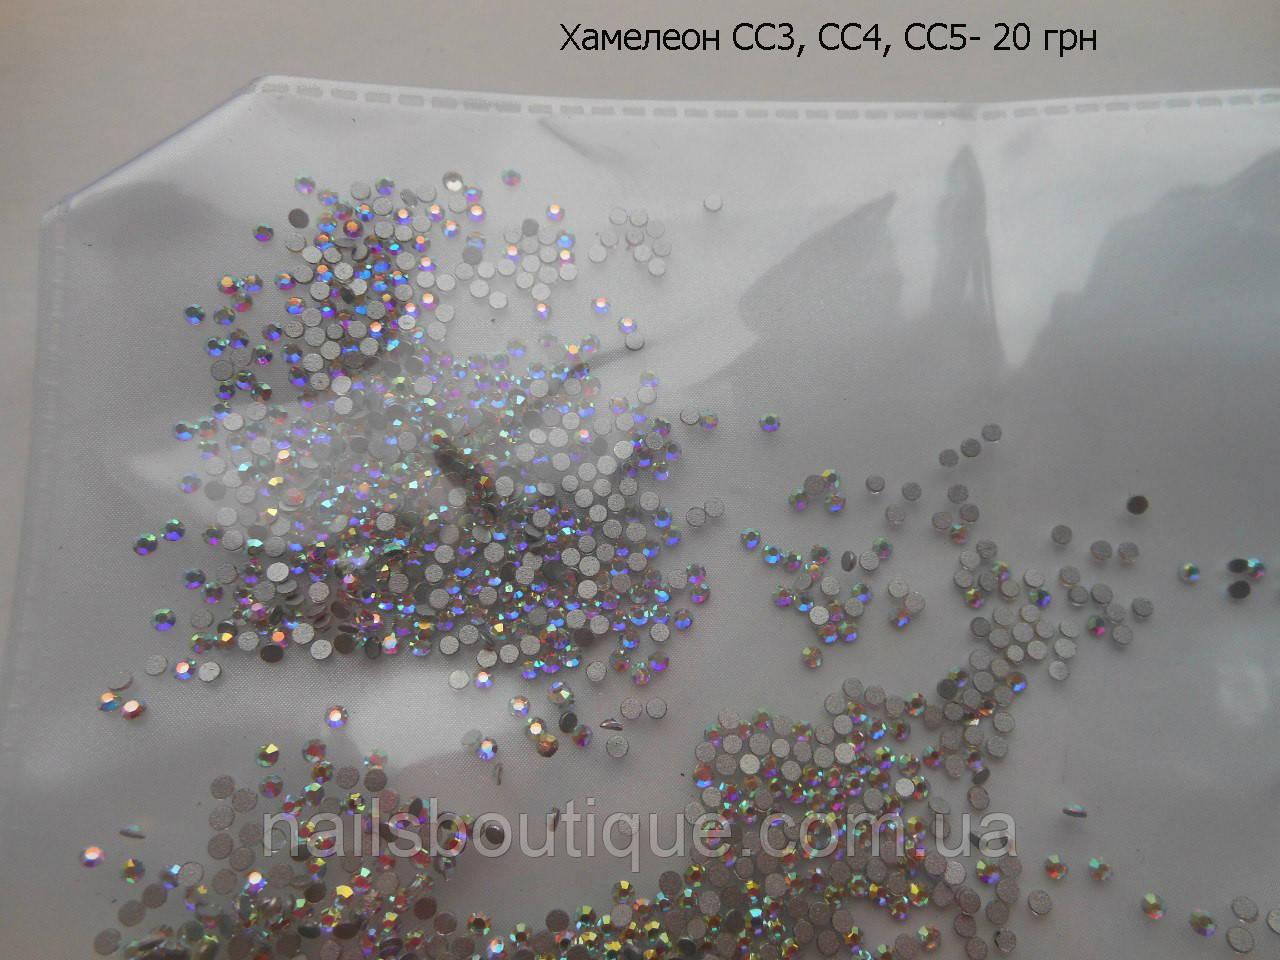 Стразы хамелеон, стекло, размер СС5 (1,4мм), 100шт